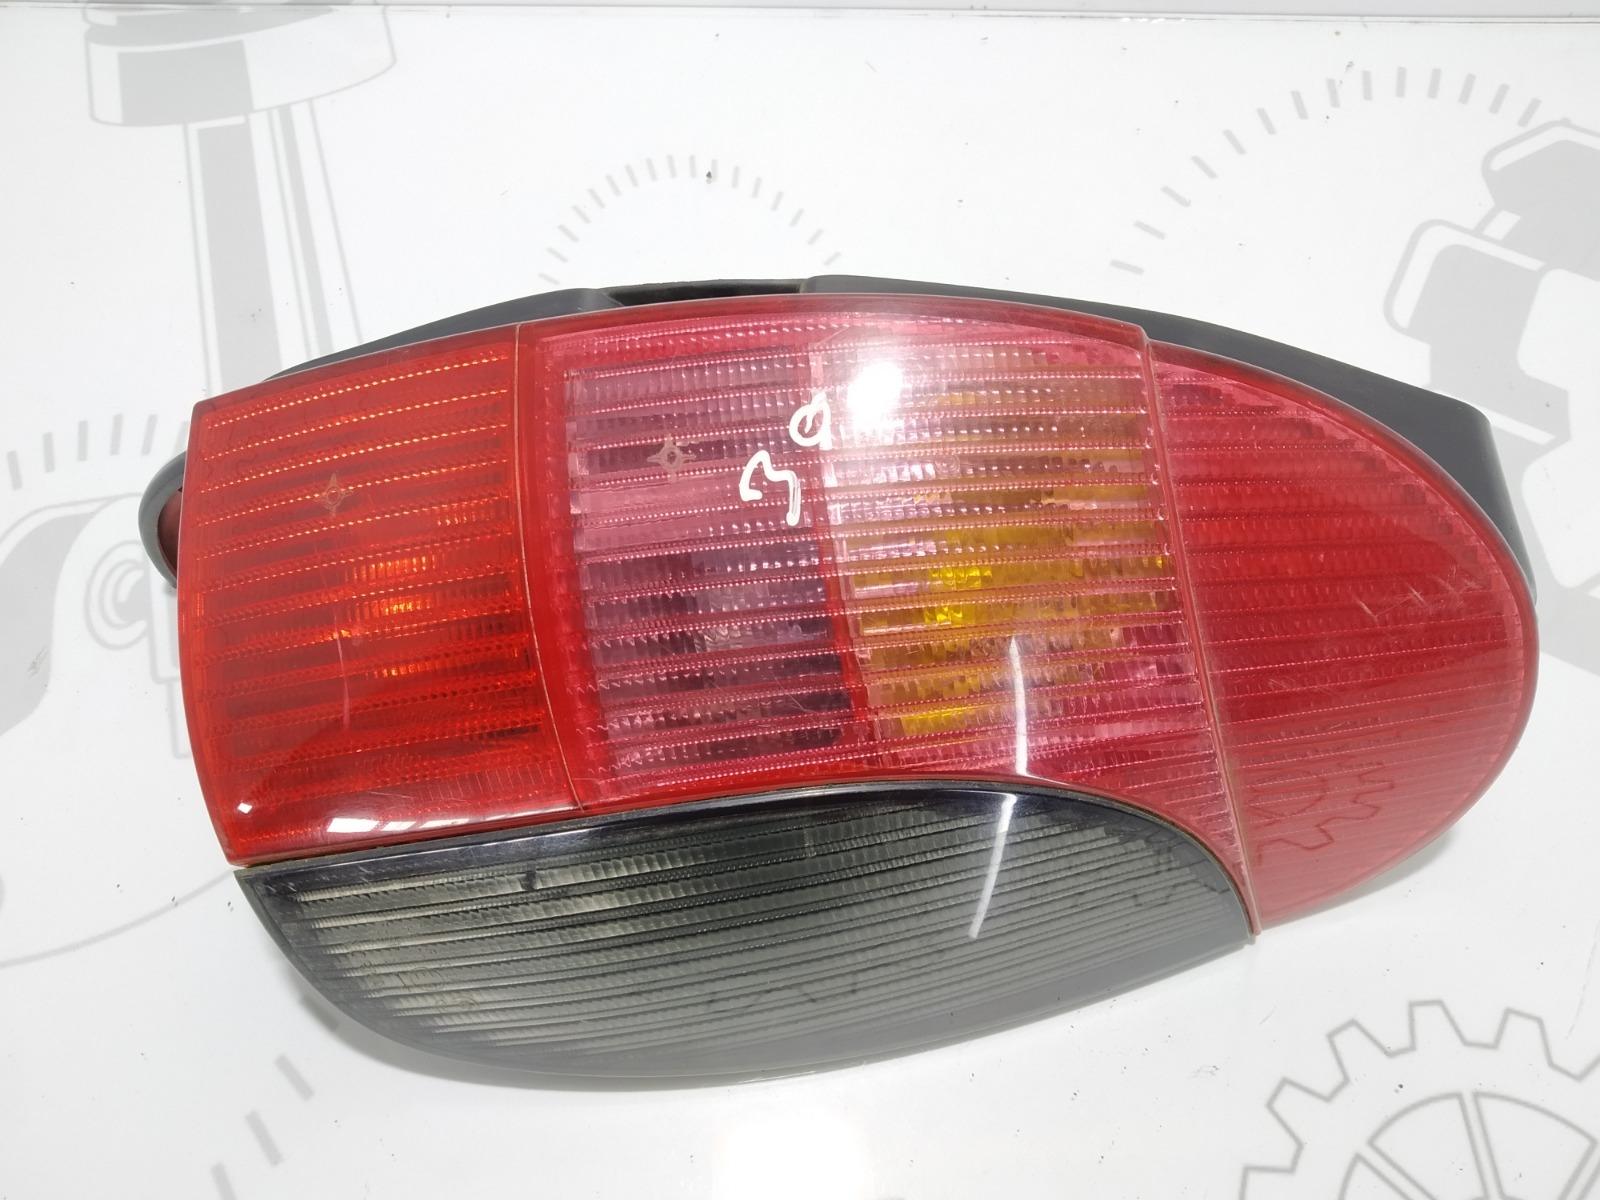 Фонарь задний правый Peugeot 306 2.0 HDI 2001 (б/у)